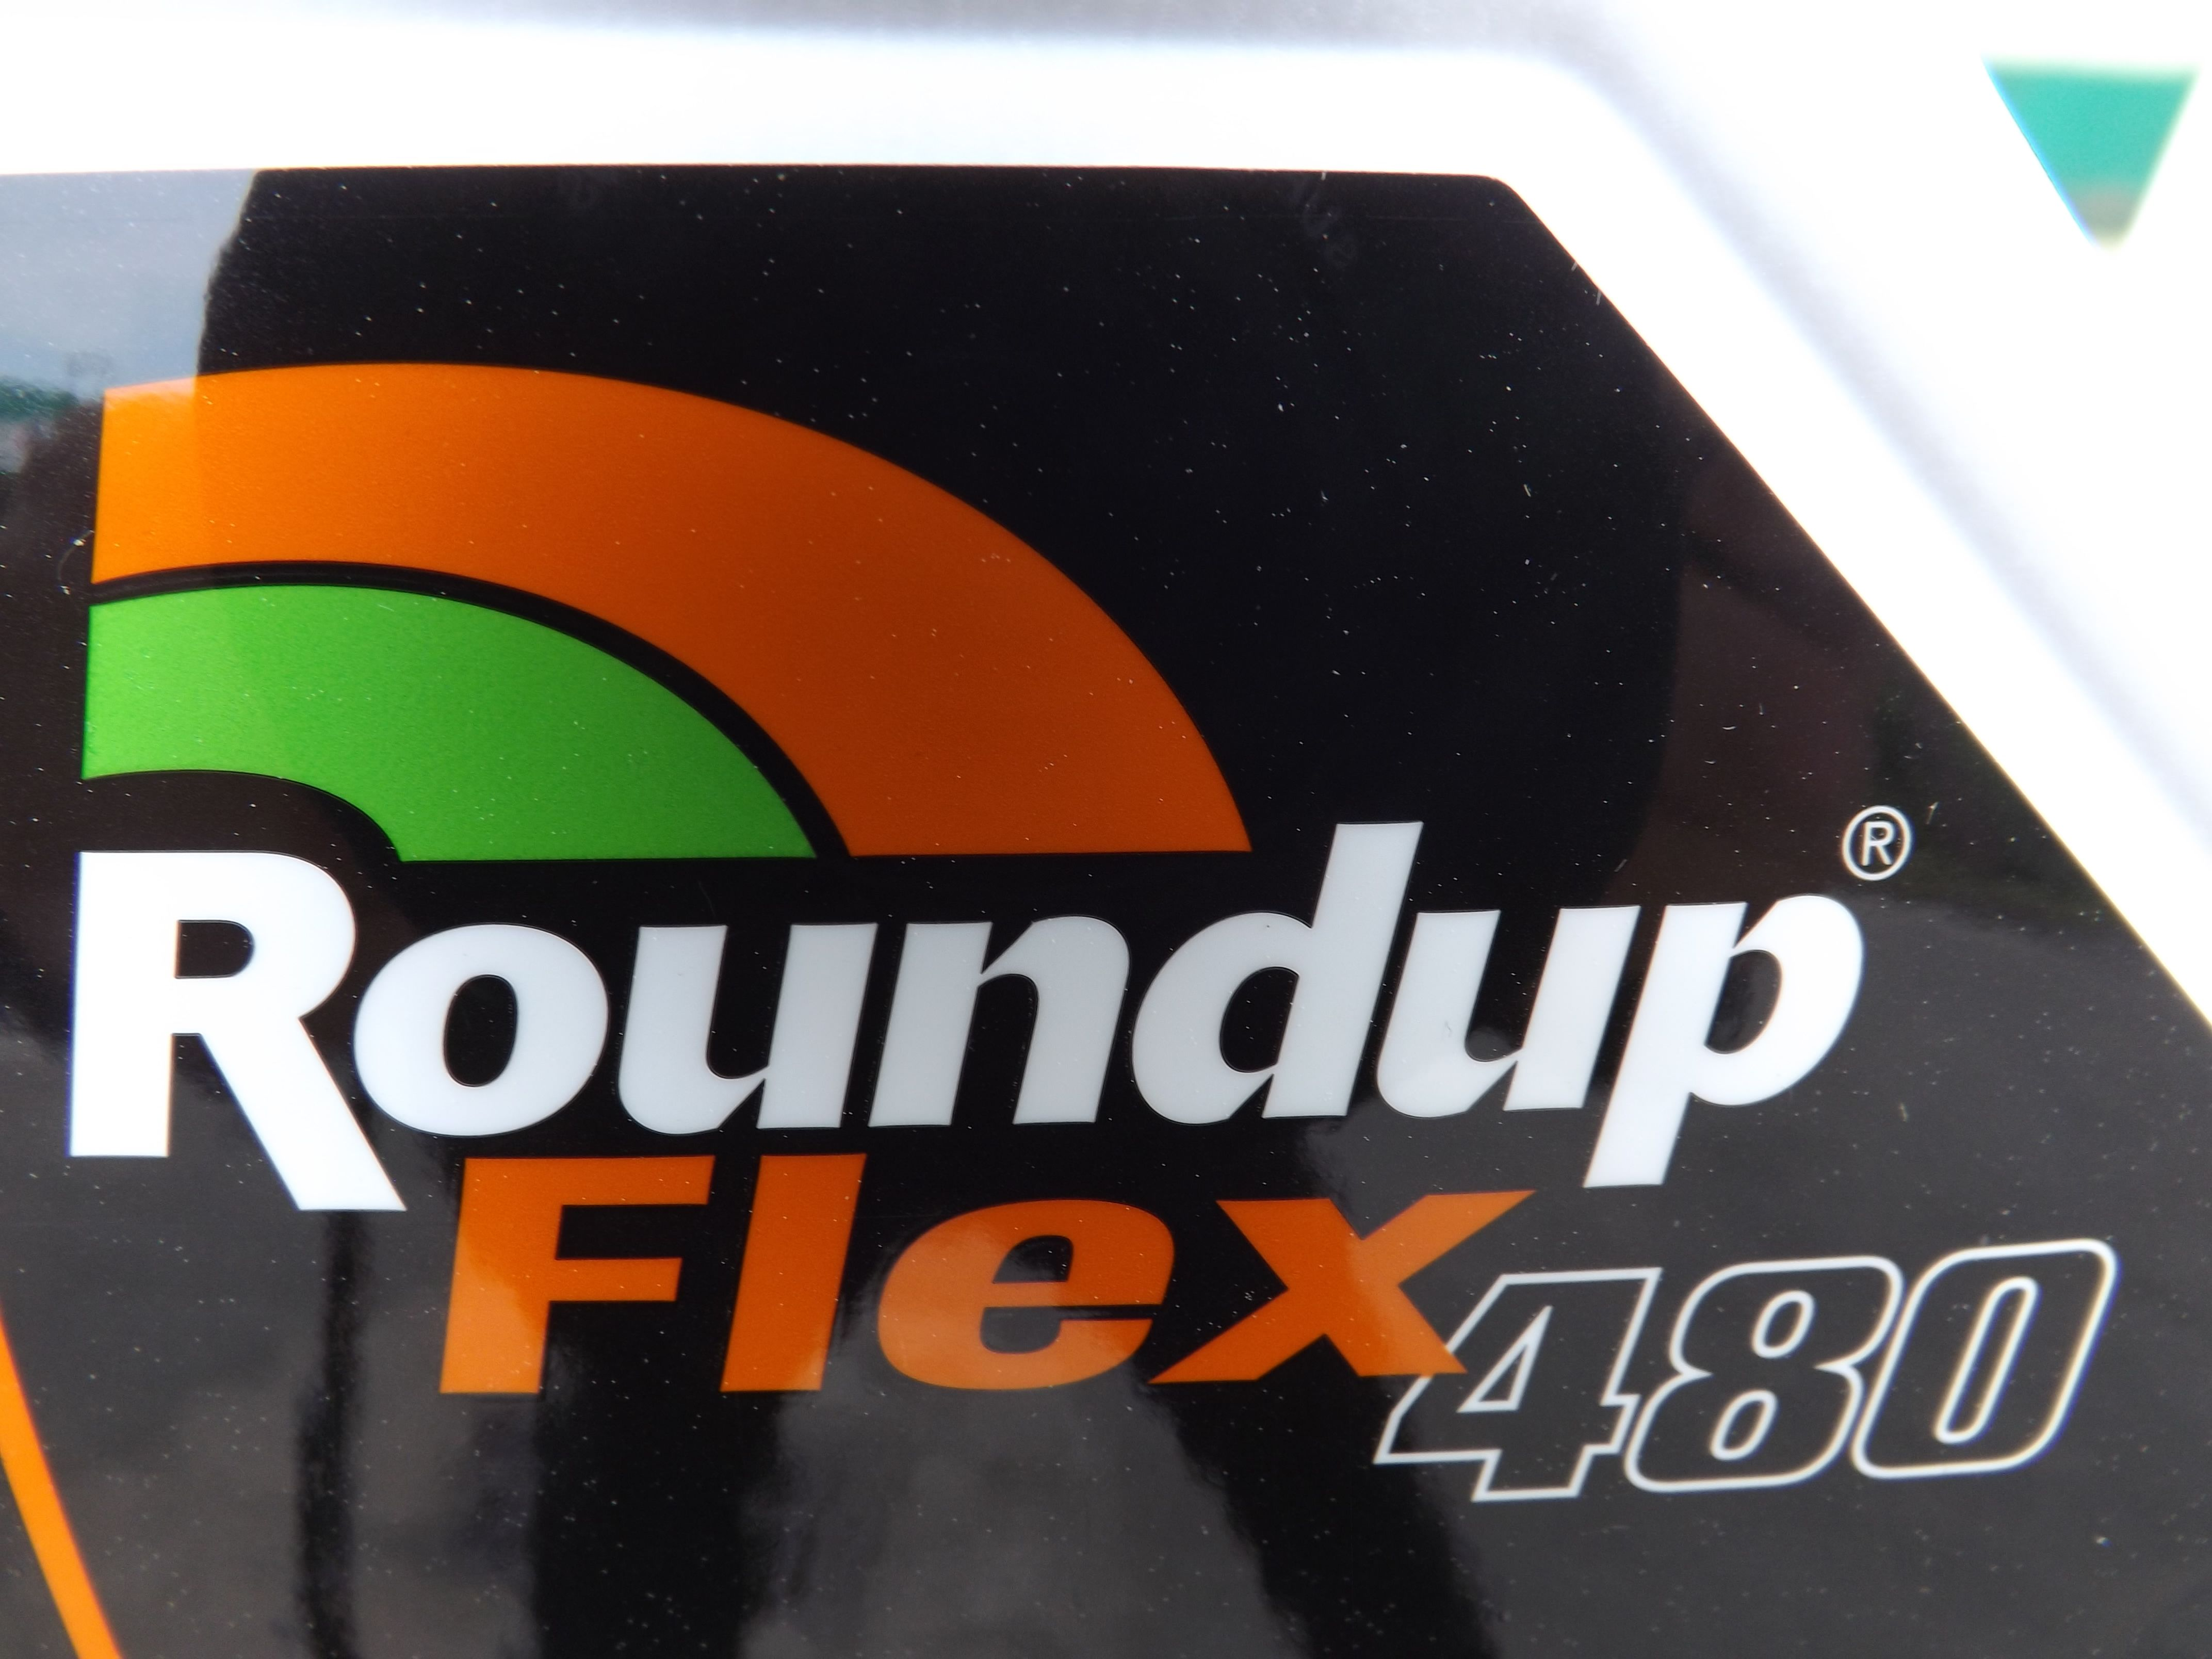 5l roundup flex powerflex dosierer30ml 2 teilig g rtnerset unkrautvernichter ebay. Black Bedroom Furniture Sets. Home Design Ideas